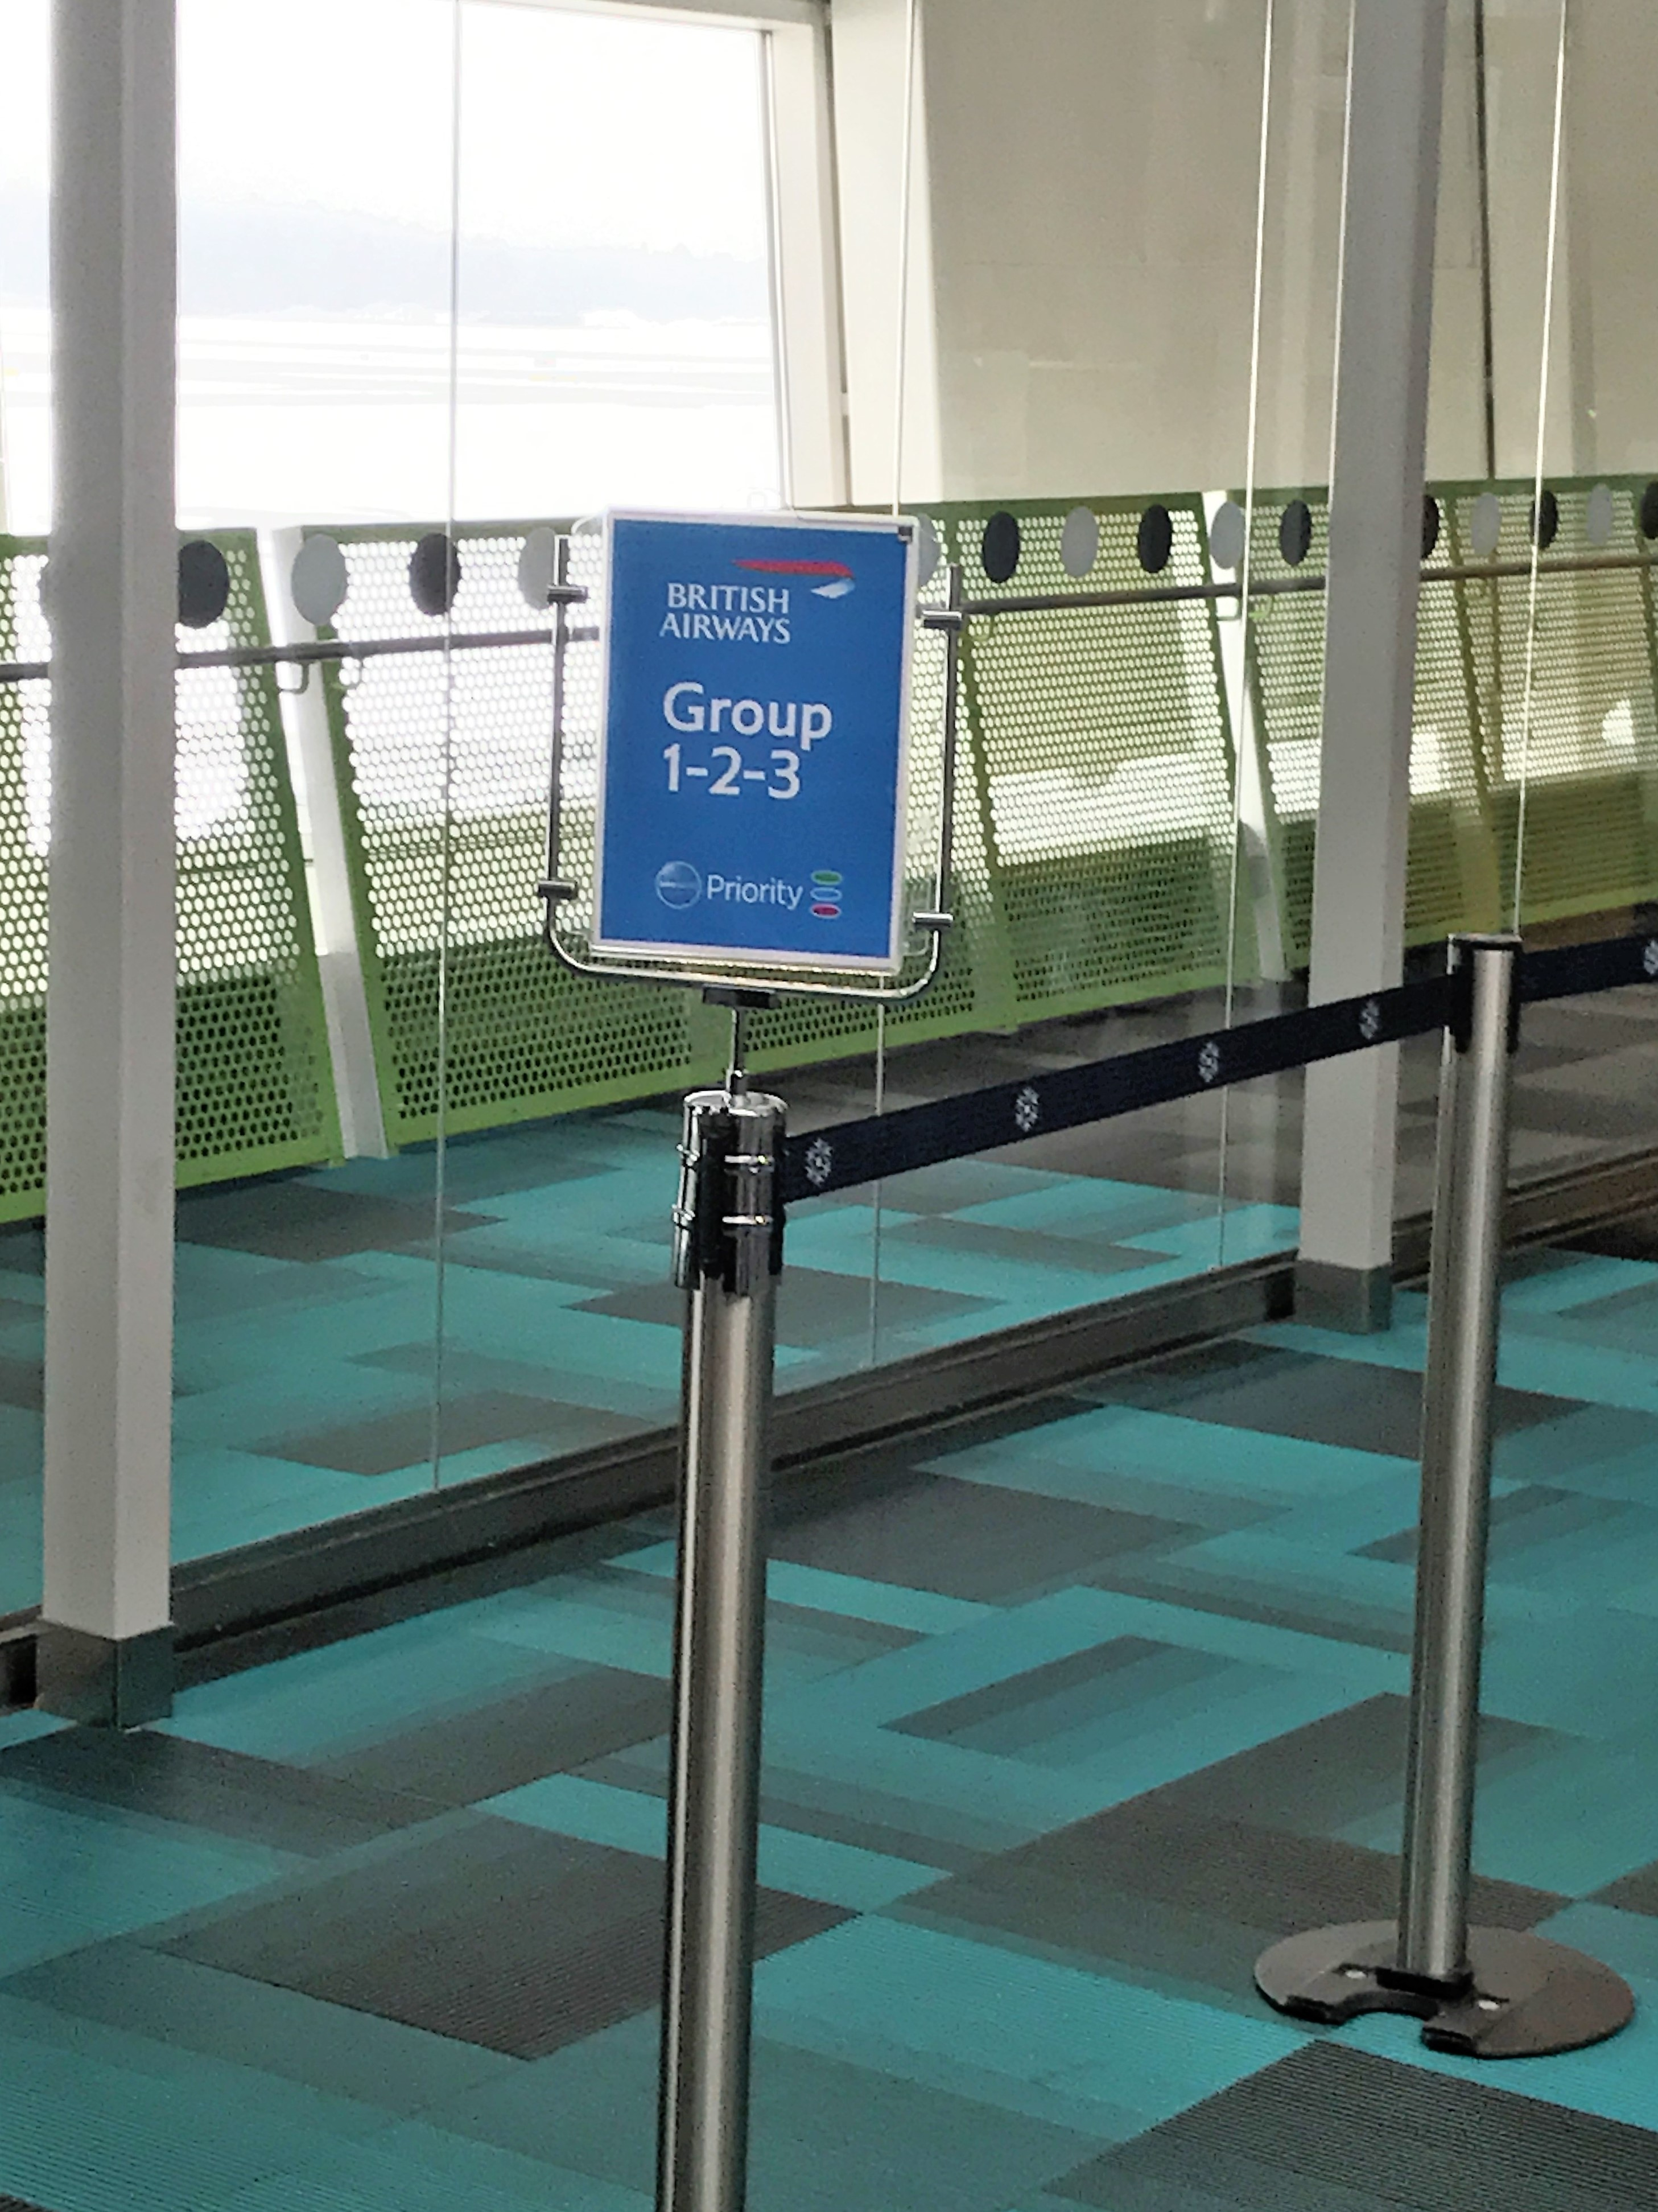 BA Group boarding sign at Stockholm